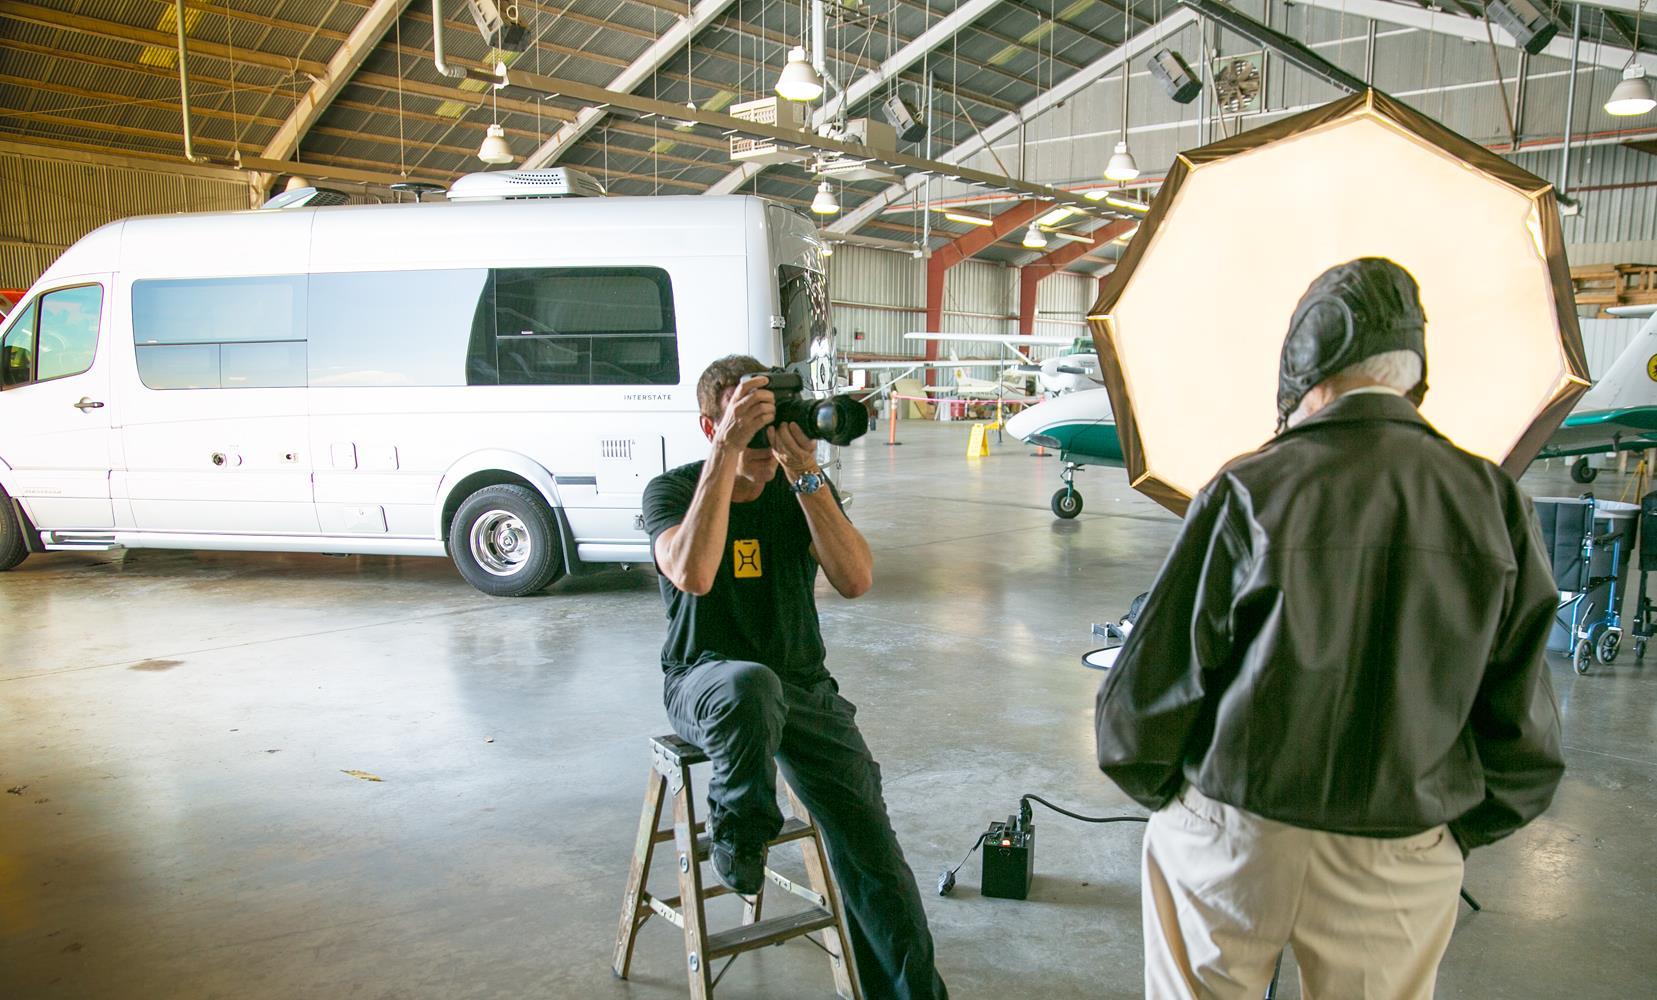 Paul Taking Photograph